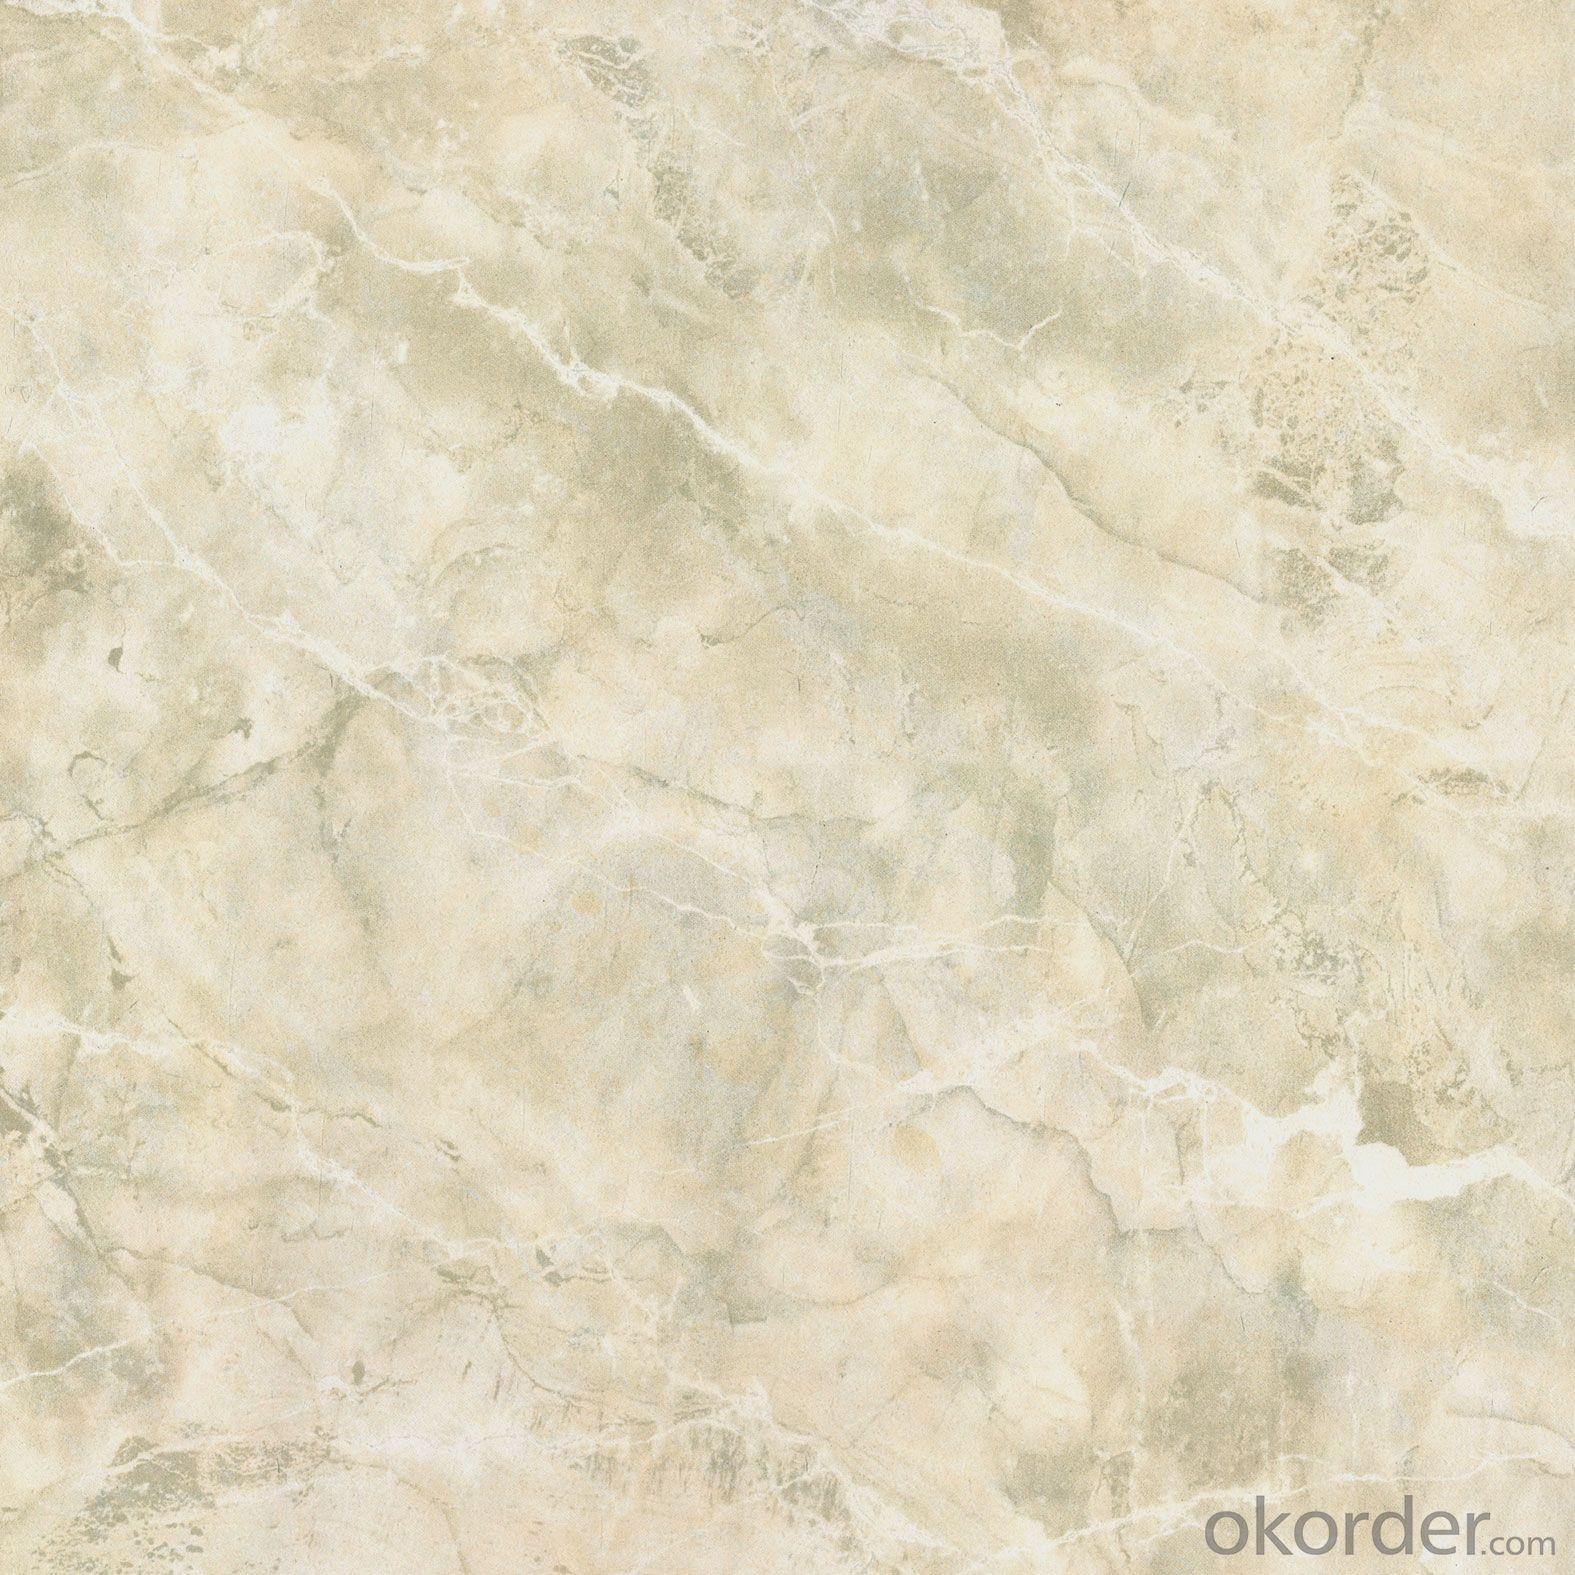 Glazed Porcelain Foor Tile, Sandstone Serie, Dark Grey Color CMAX-LV6004